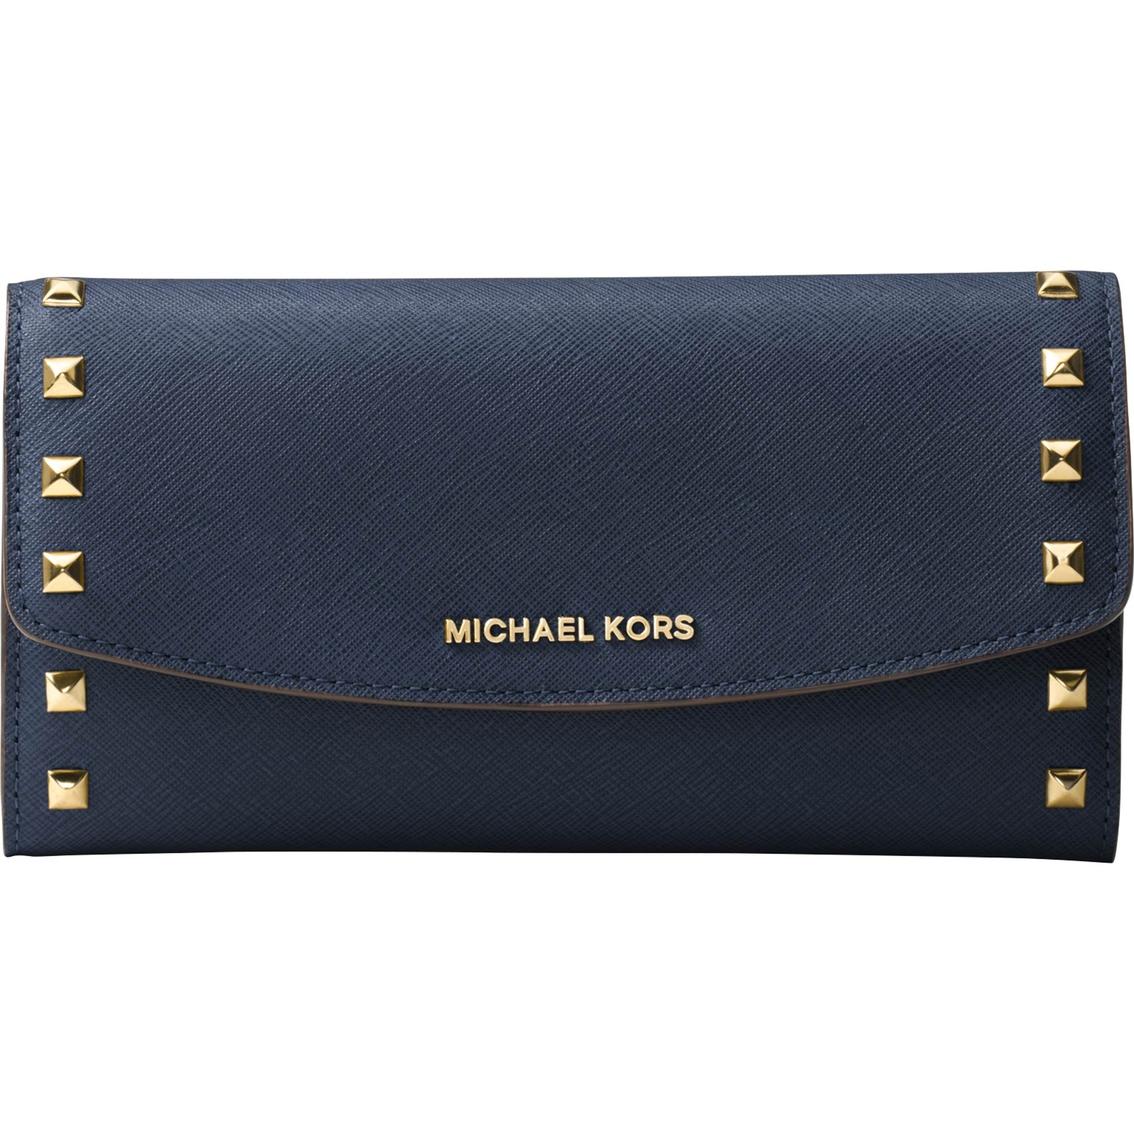 32519703c146 Michael Kors Ava Stud Large Trifold Wallet | Wallets | Handbags ...